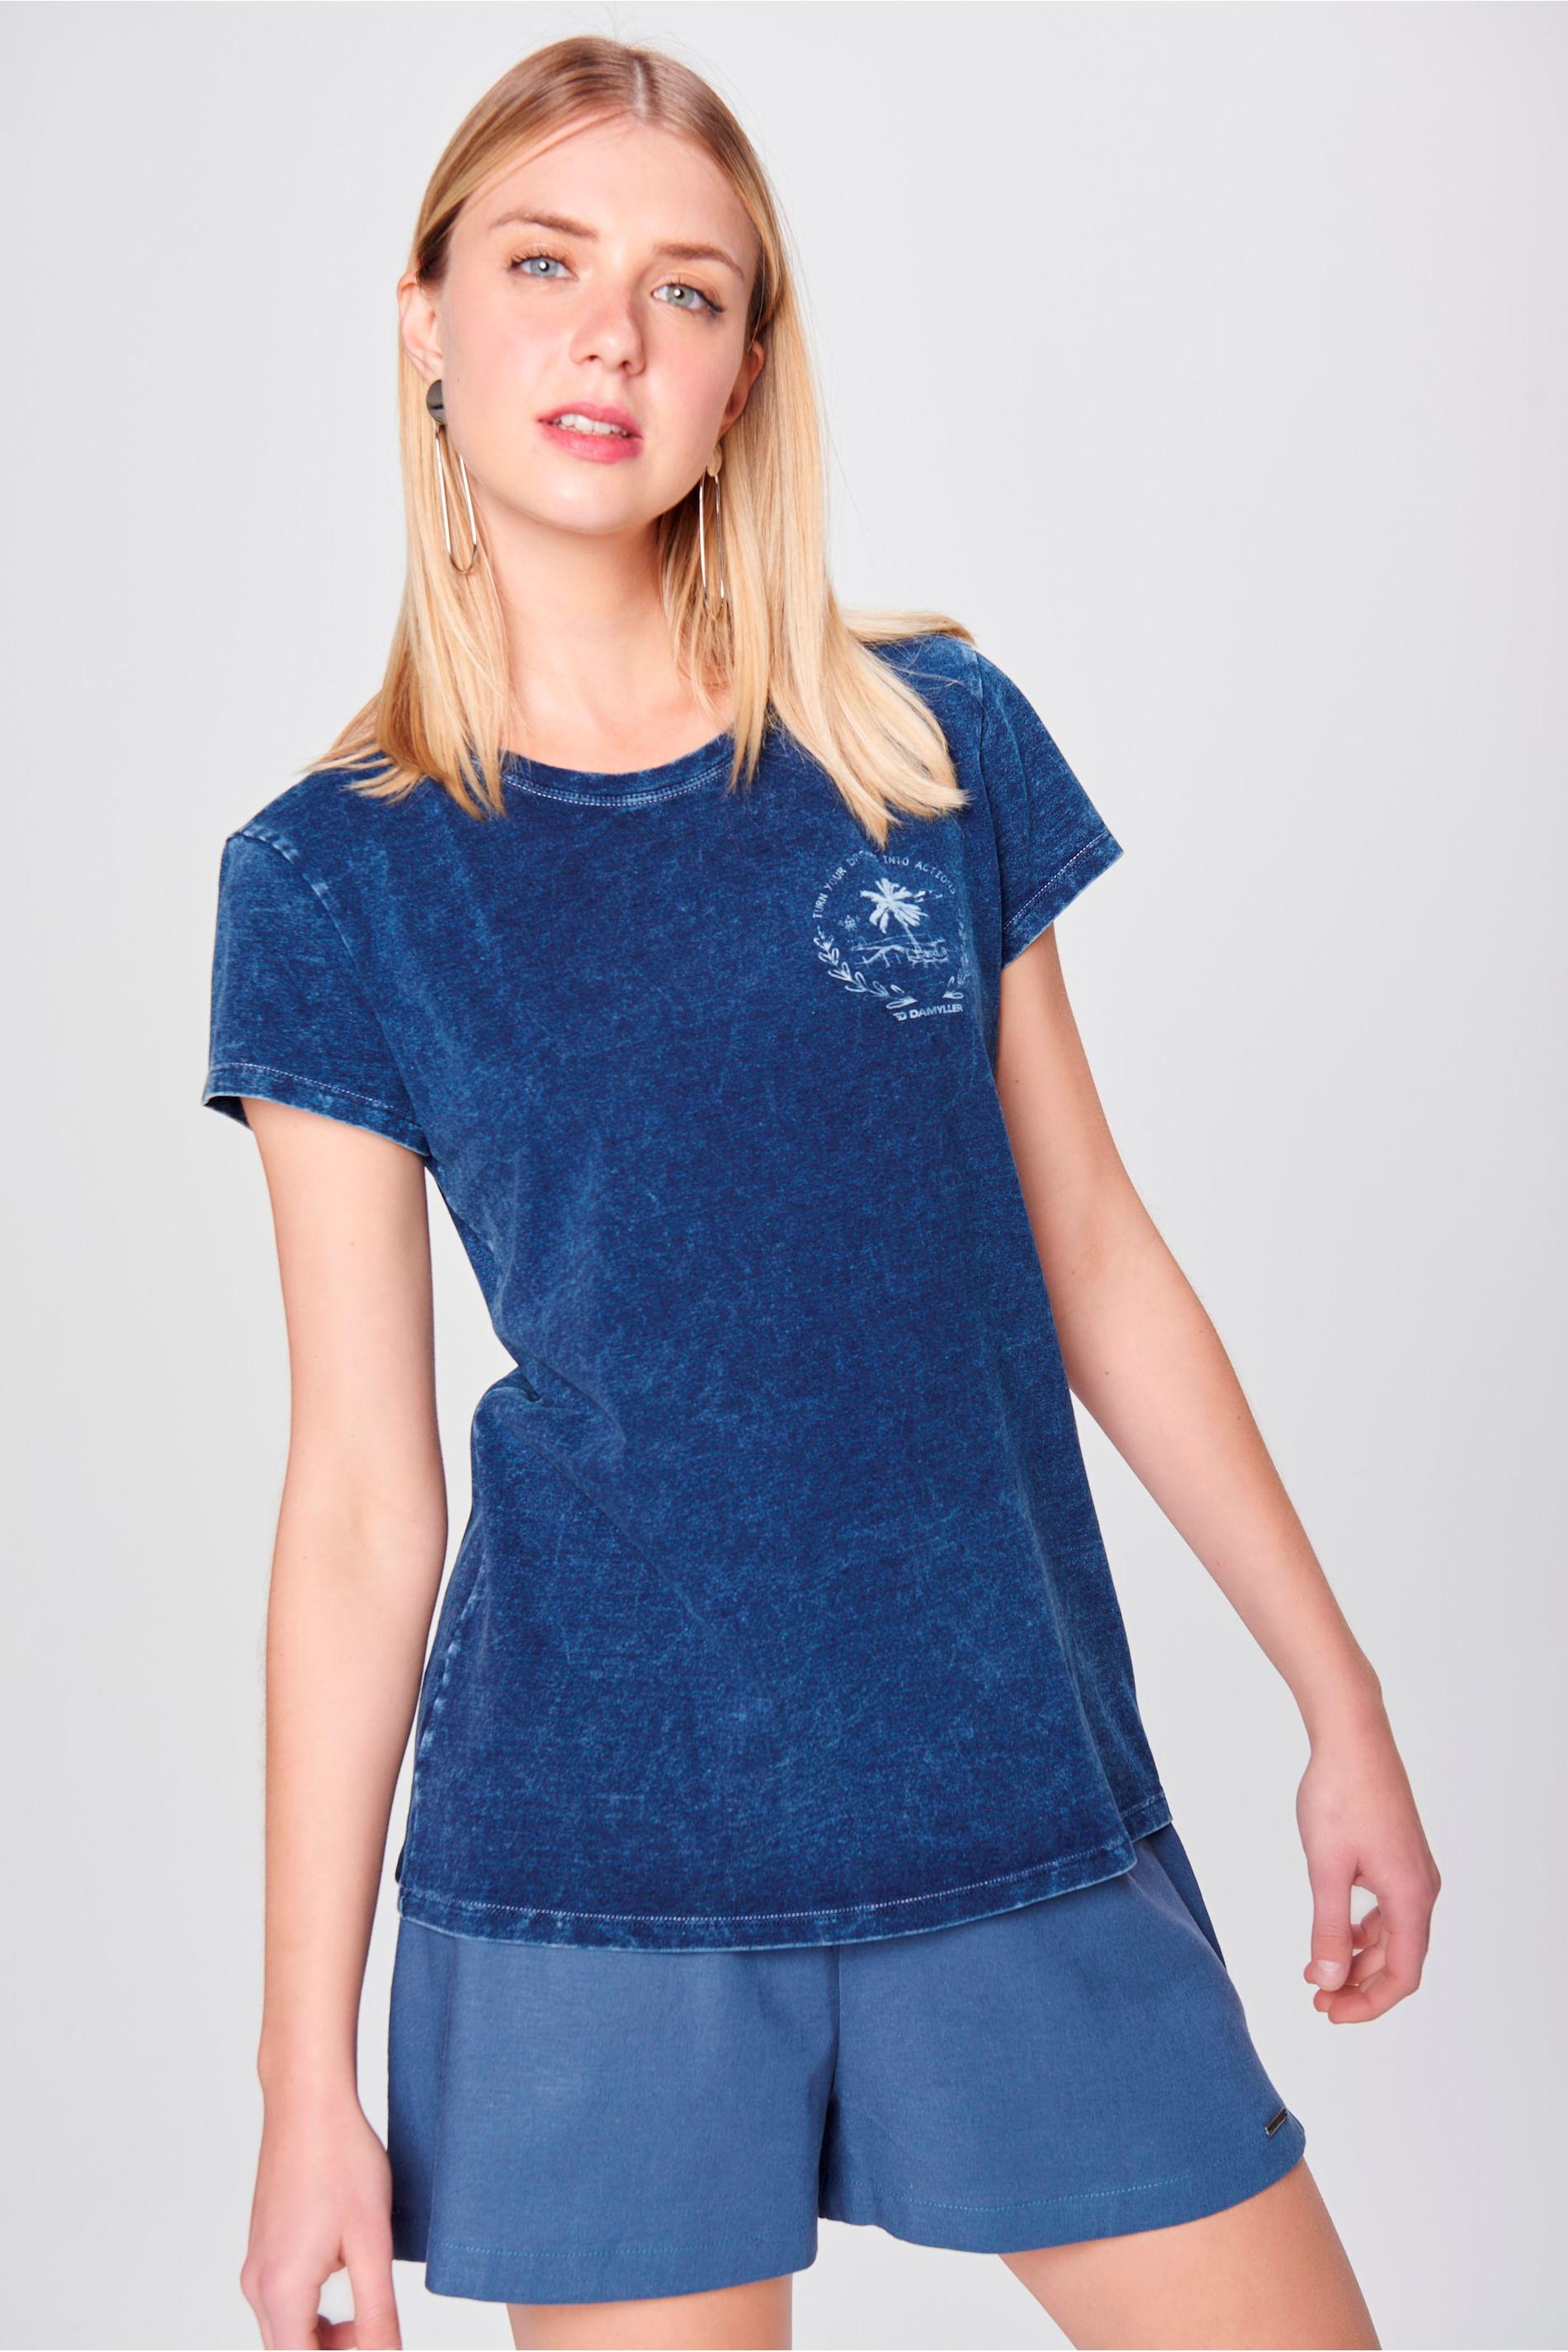 Camiseta de Malha Denim Feminina - Damyller 878f534e435b9